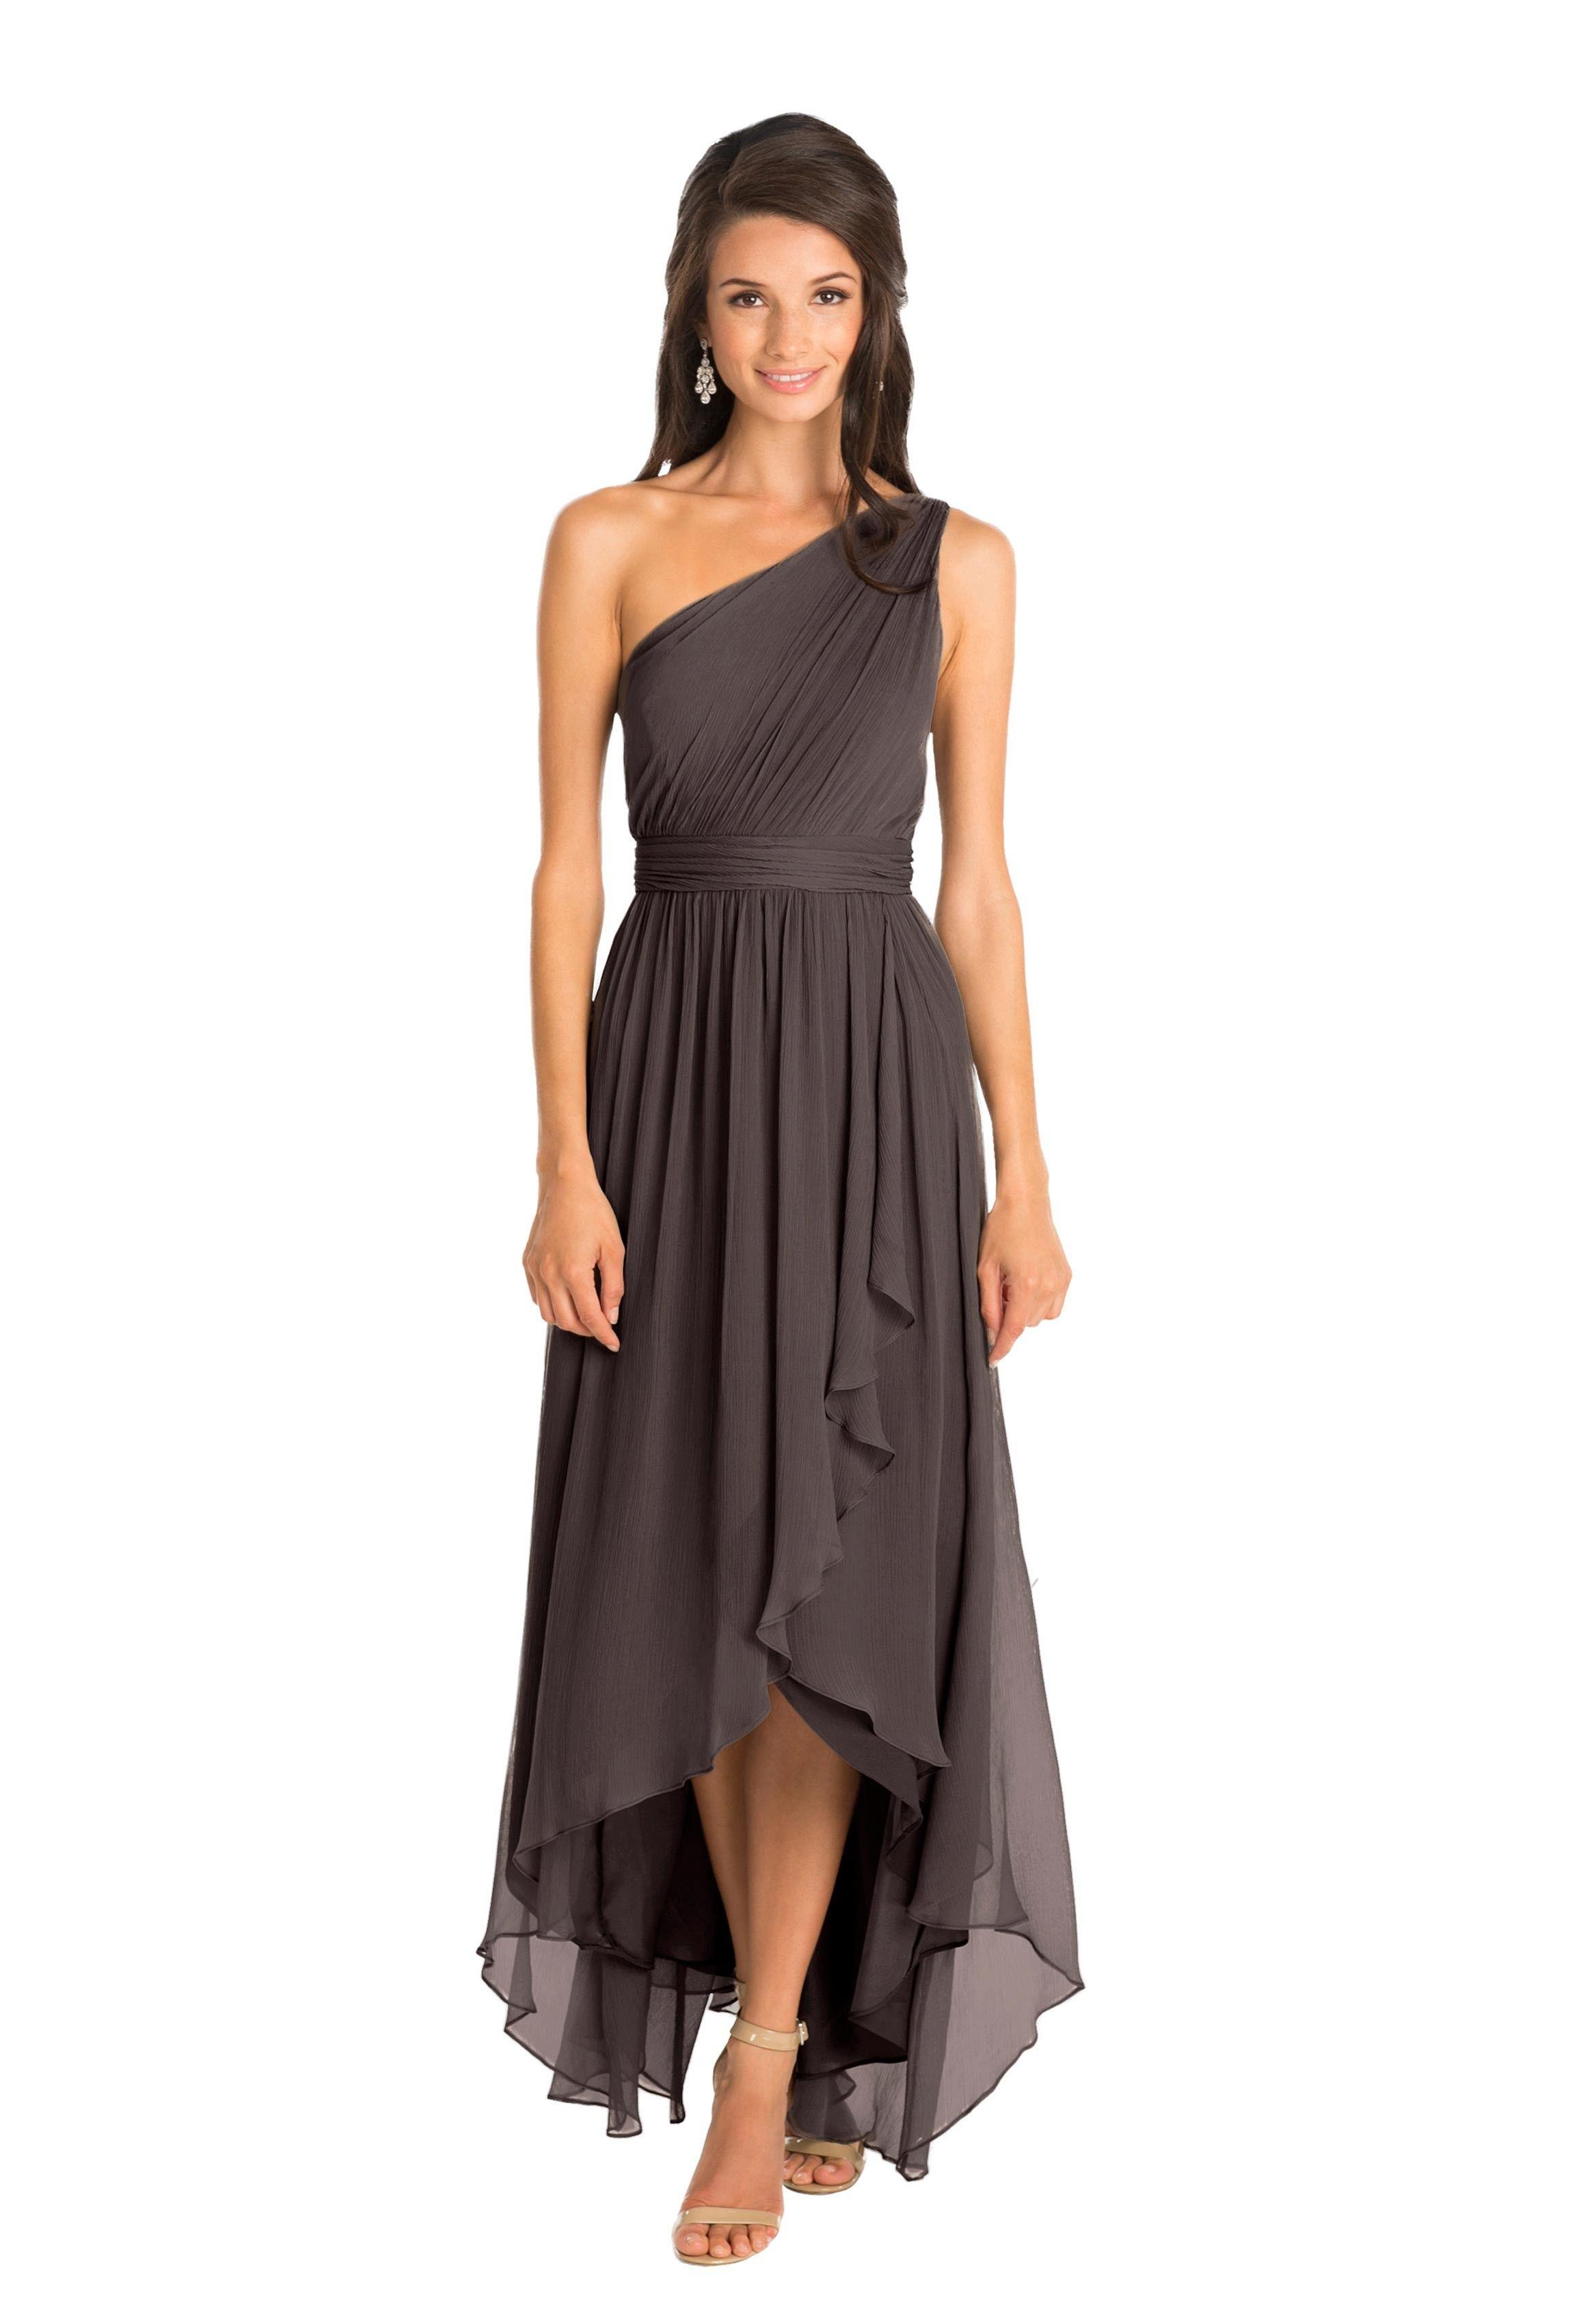 A Floor Length Silk Crinkle Chiffon Bridesmaid Dress With One Shoulder Design